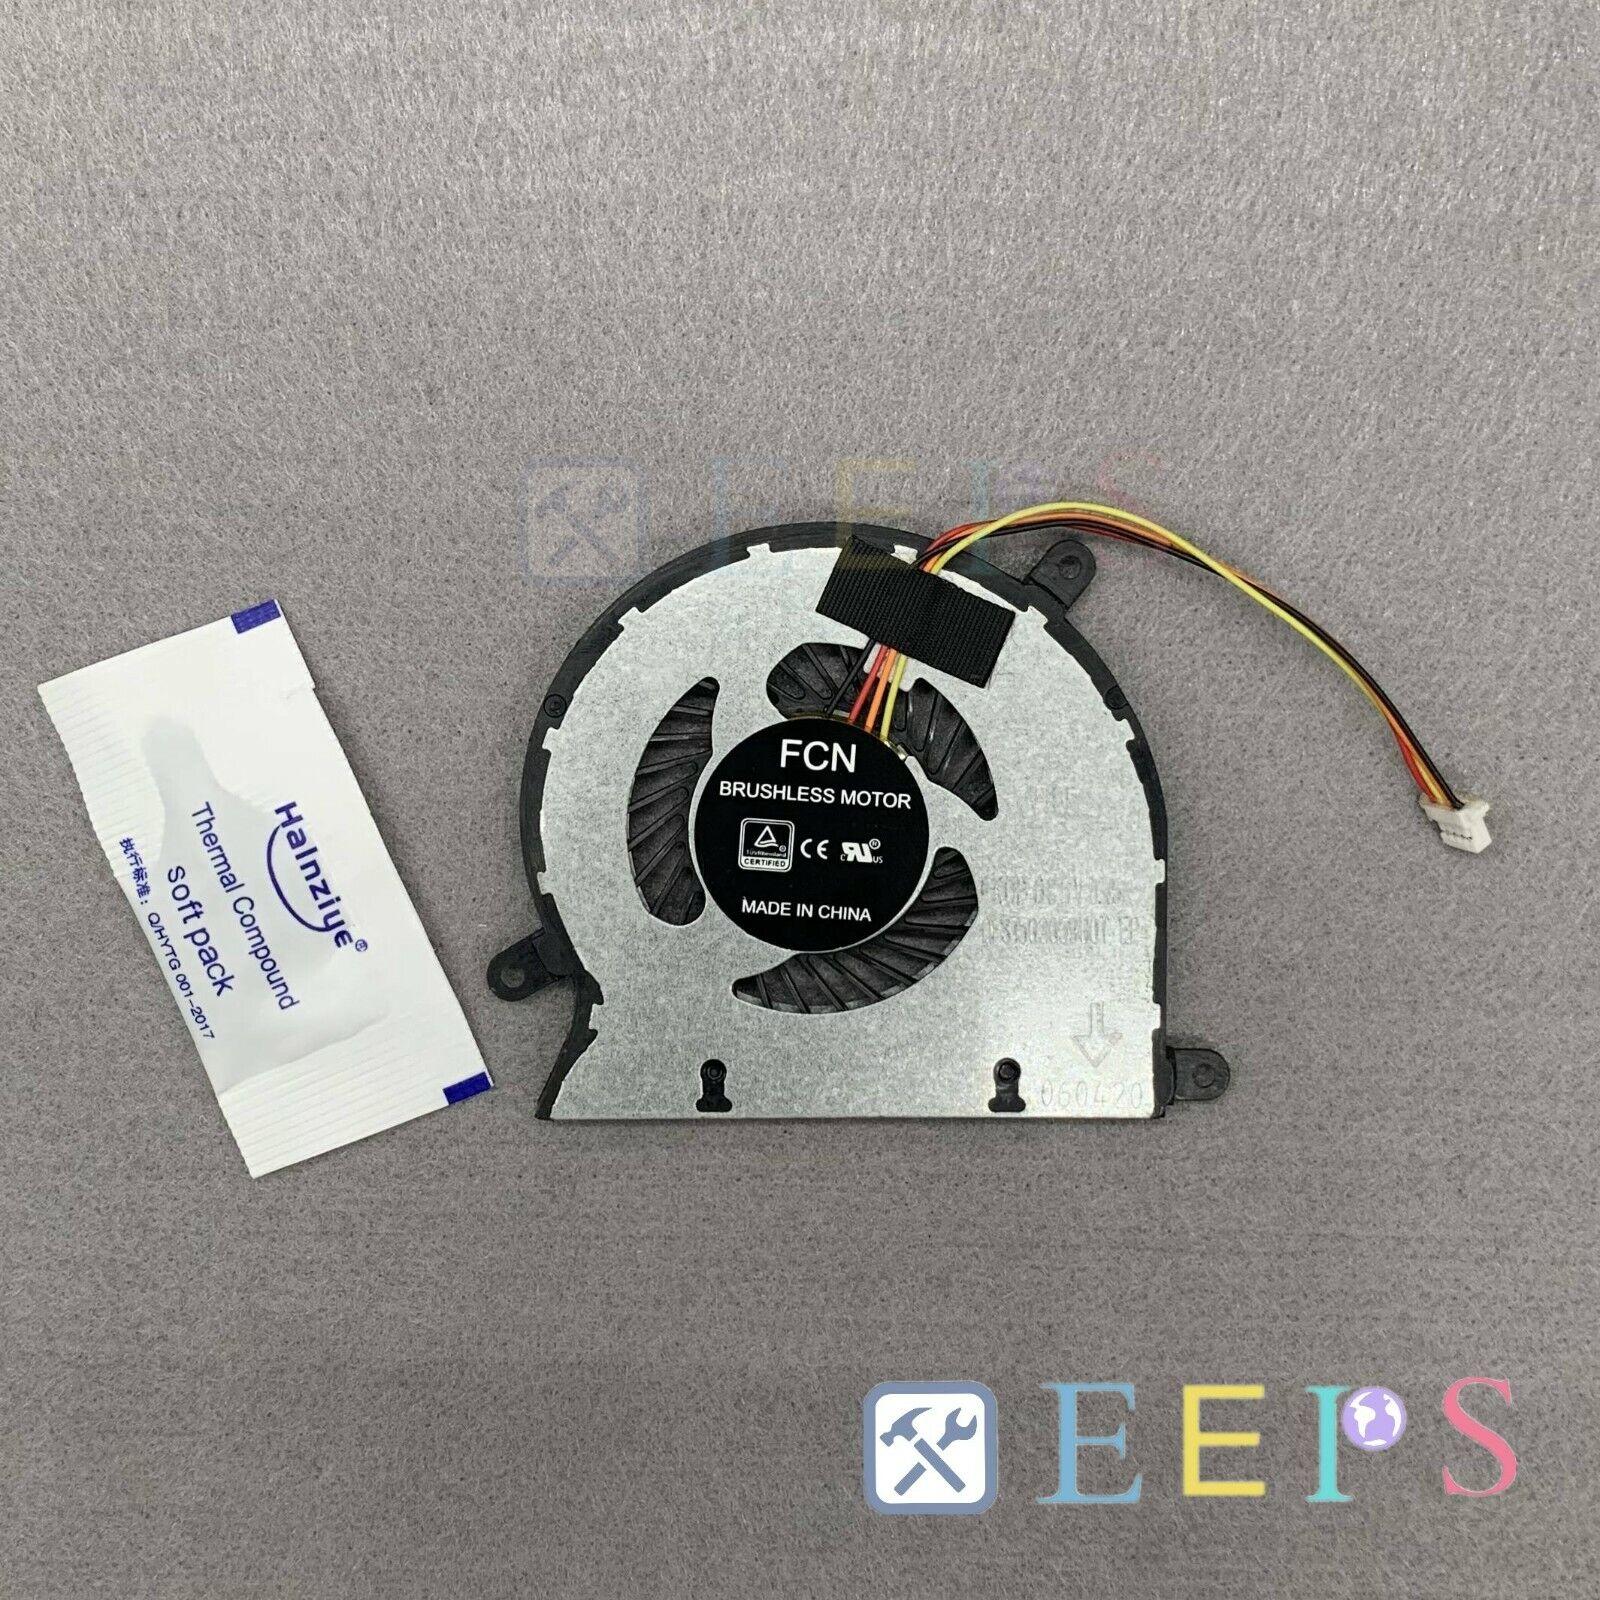 FK0P For ACER Aspire C22 C22-760 C22-962 C22-820 C24 C24-865 CPU cooling fan FCN